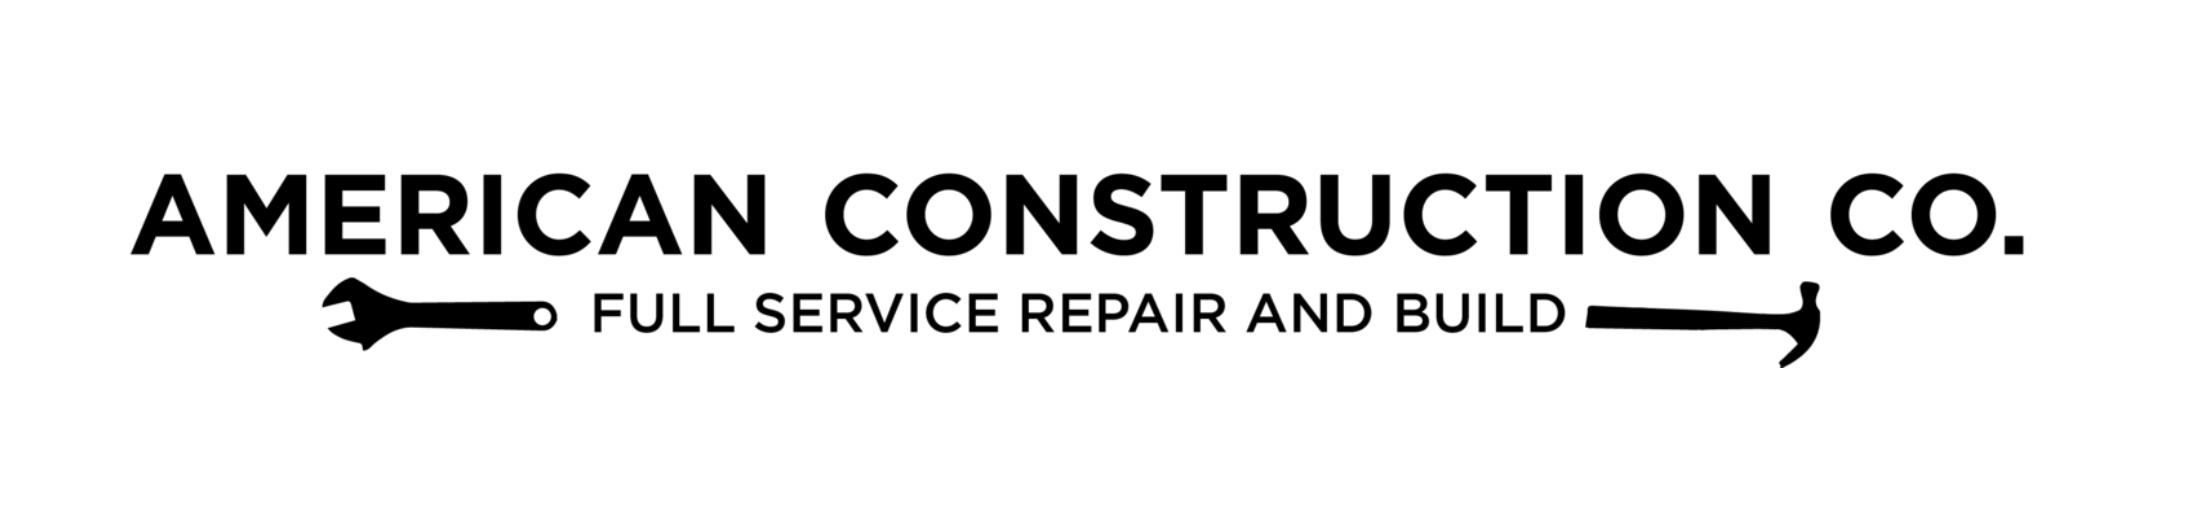 American Construction Co.